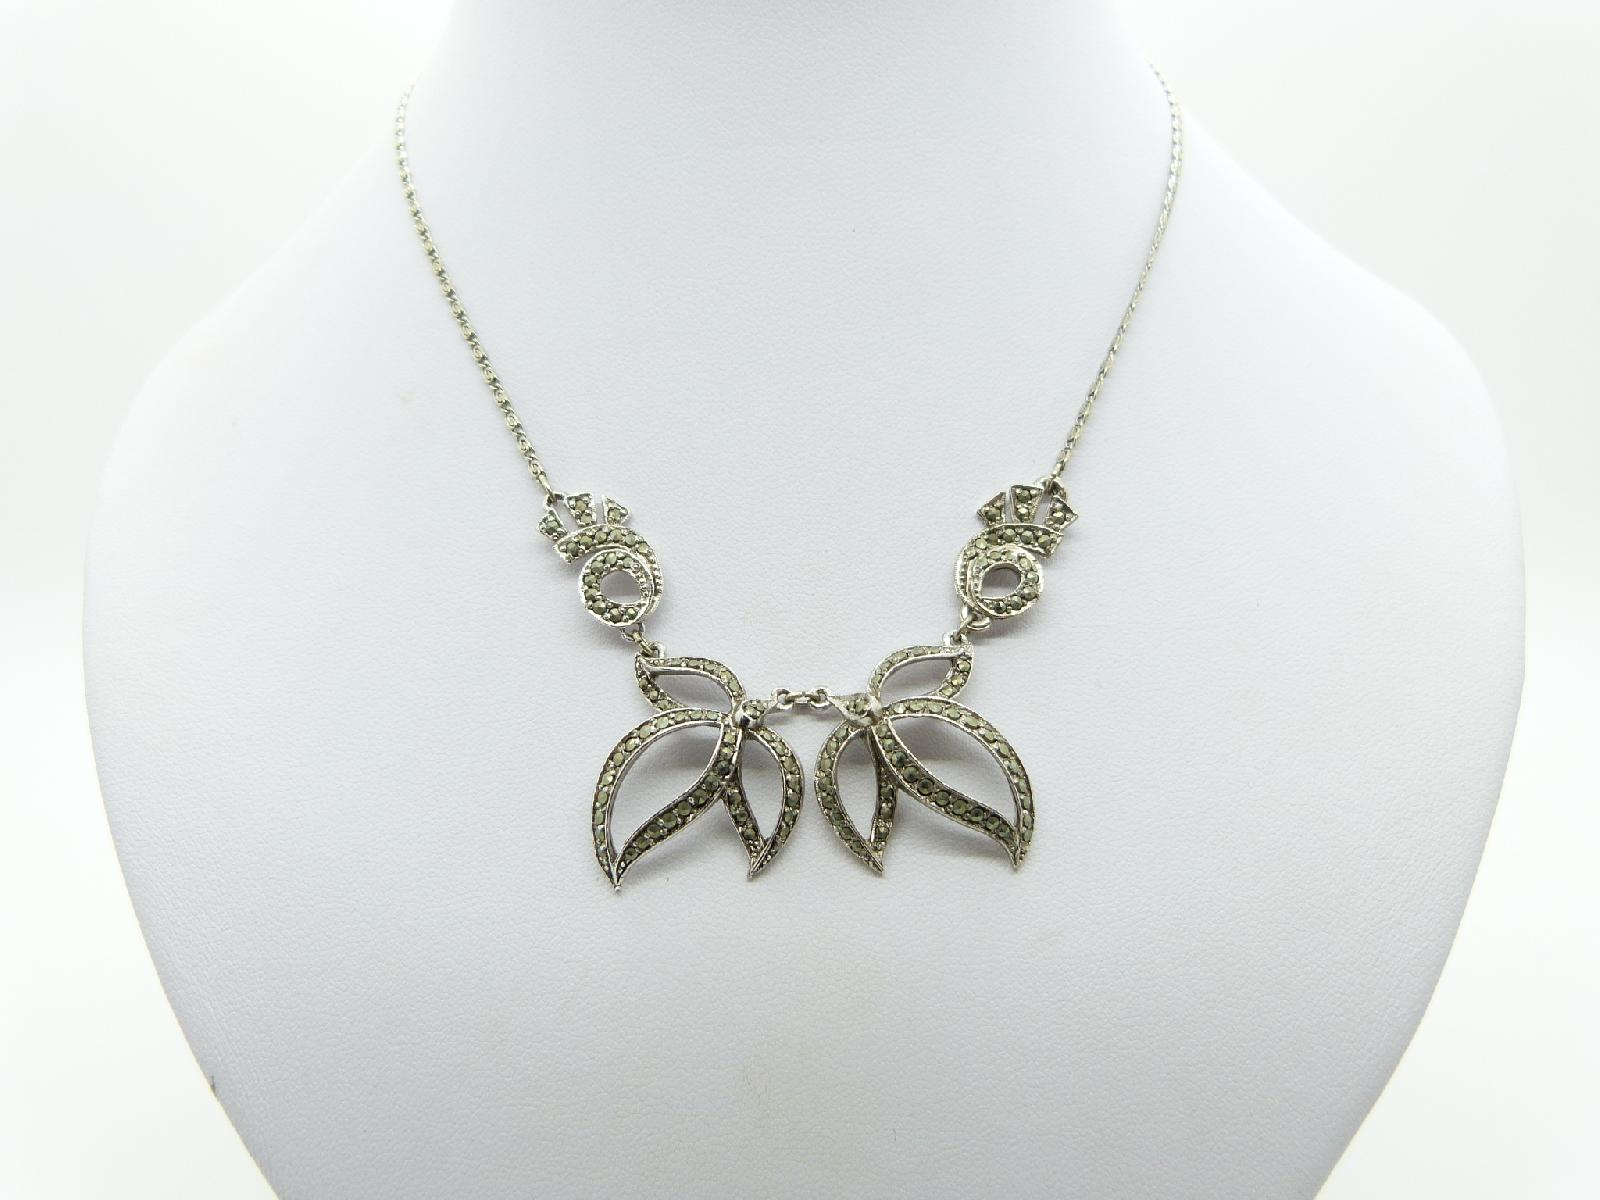 £15.00 - Vintage 30s Beautiful Marcasite Floral Drop Design Silvertone Necklace 40cms